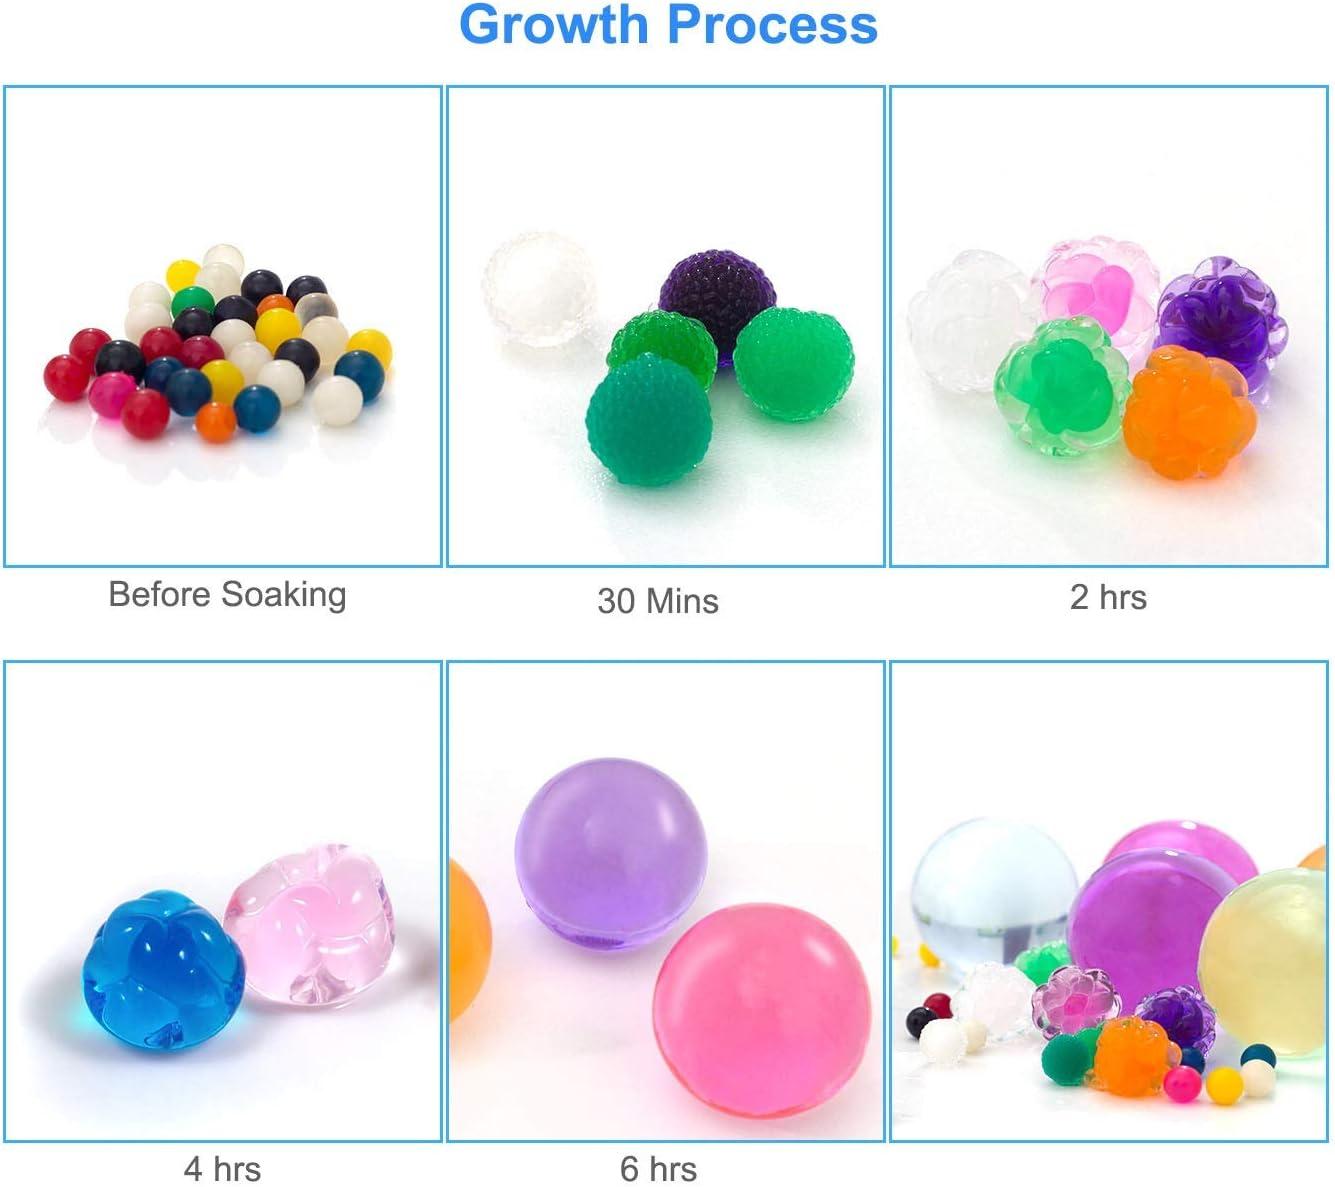 Crystal Expanding 200 Water Beads Gel Balls Wedding Decoration BUY 4 GET 4 FREE